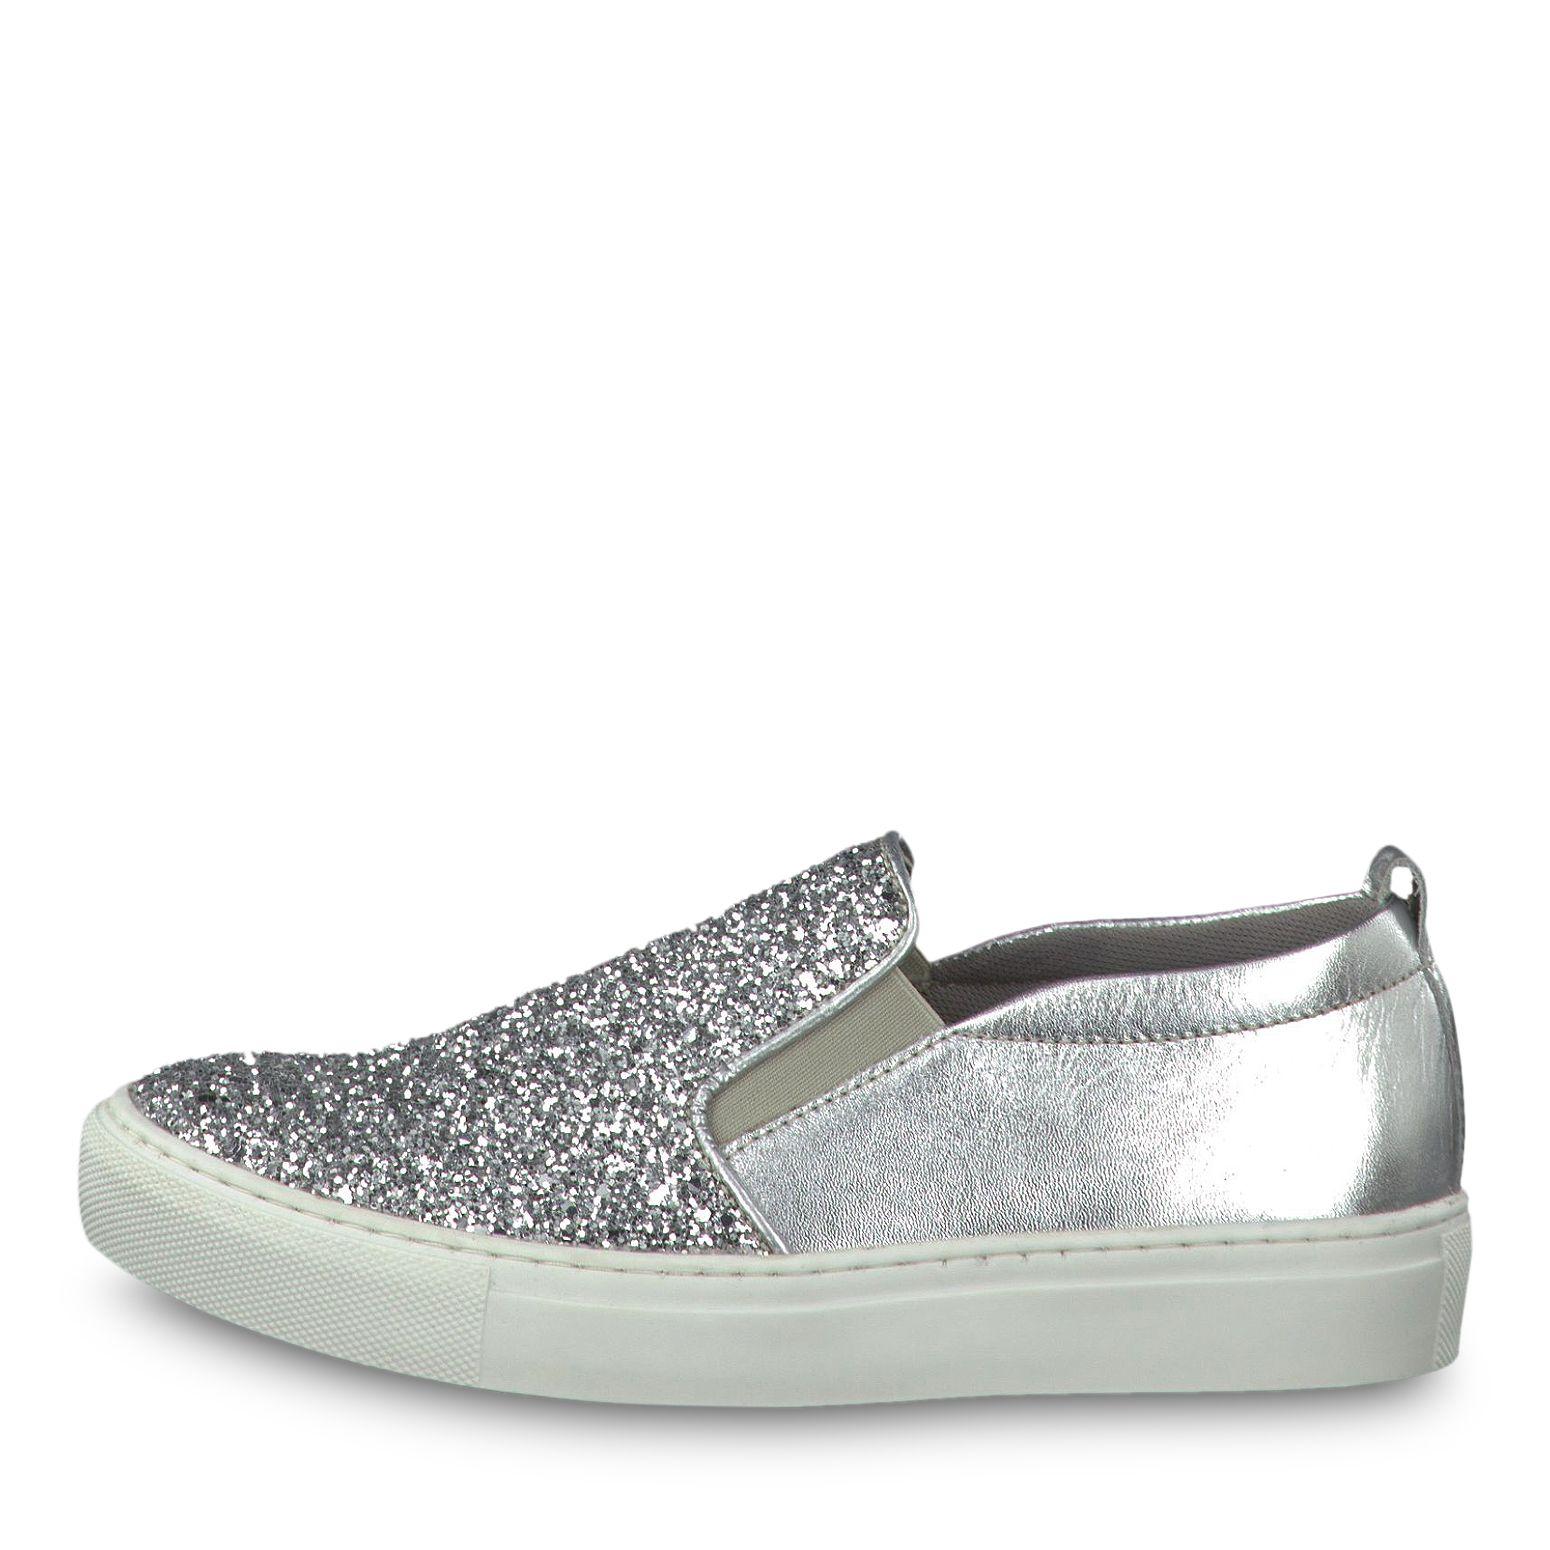 Tamaris Esbelta Slipper   Just Shoes. My Faves   Shoes